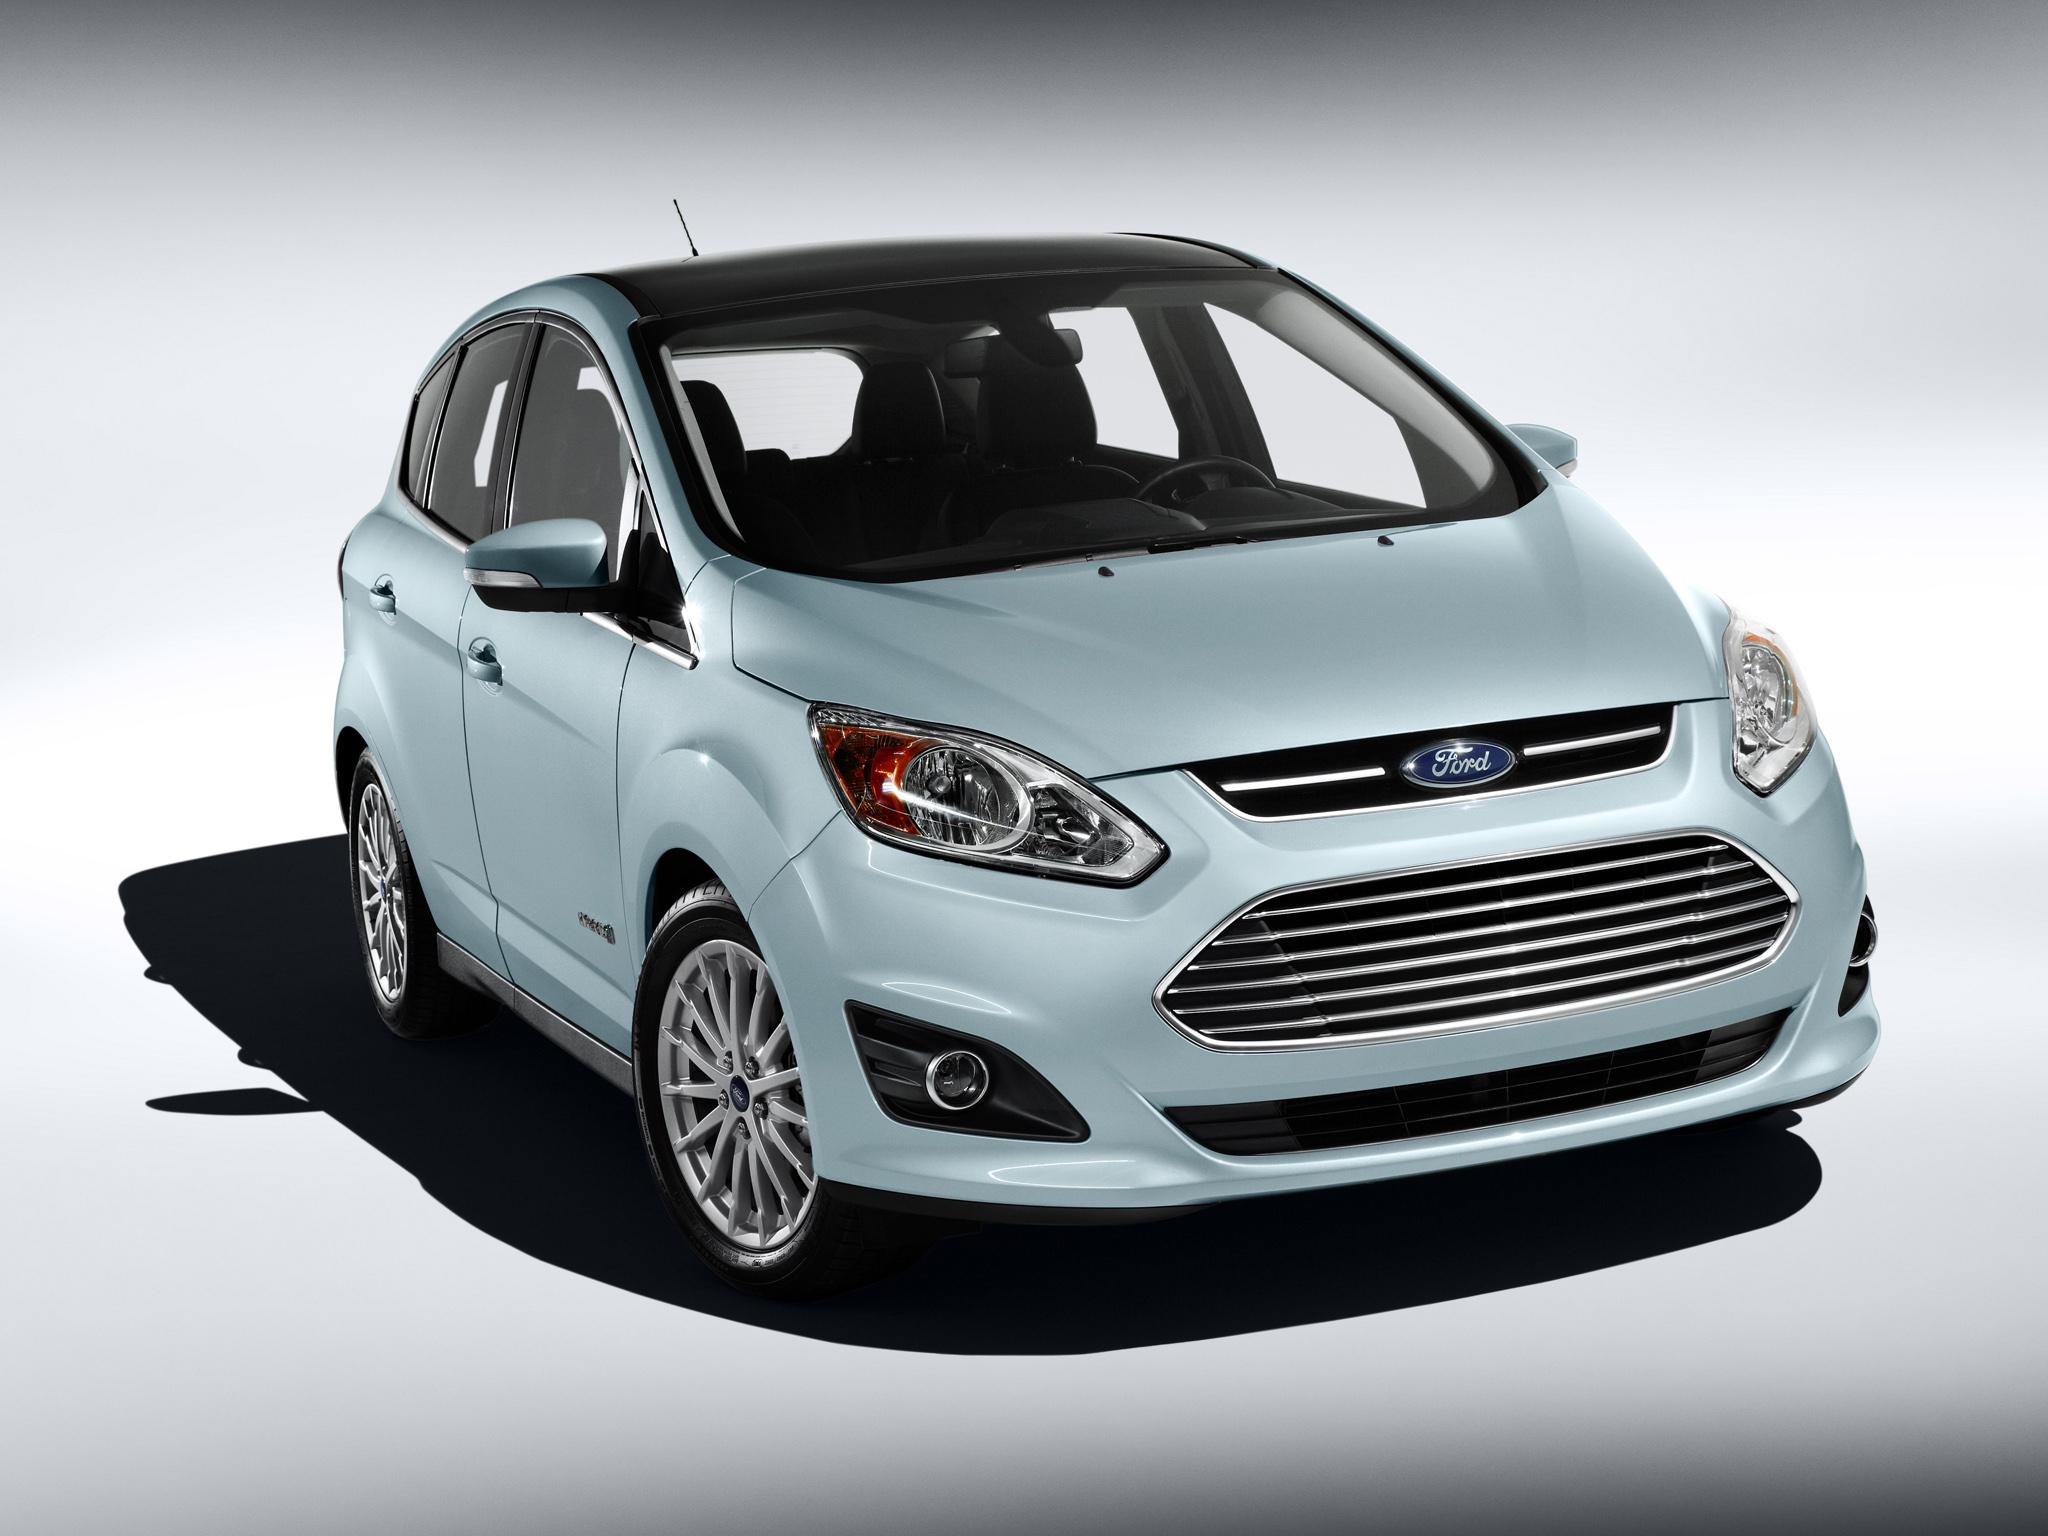 Продажа Ford (Форд) в России - auto.drom.ru